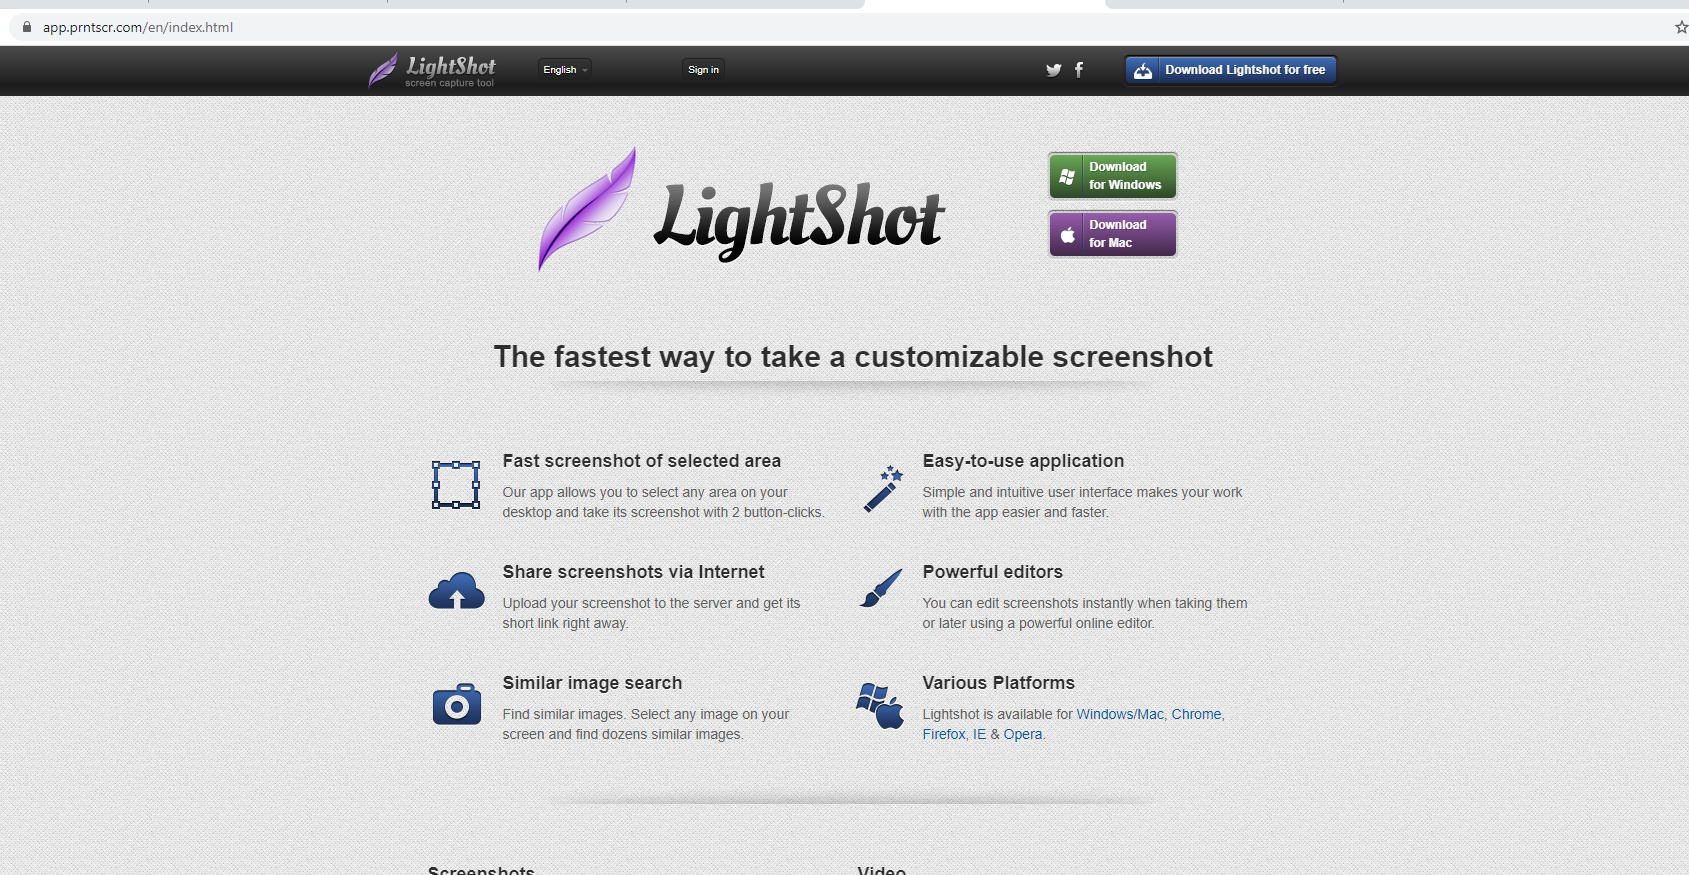 Ứng dụng phần mềm lightshot